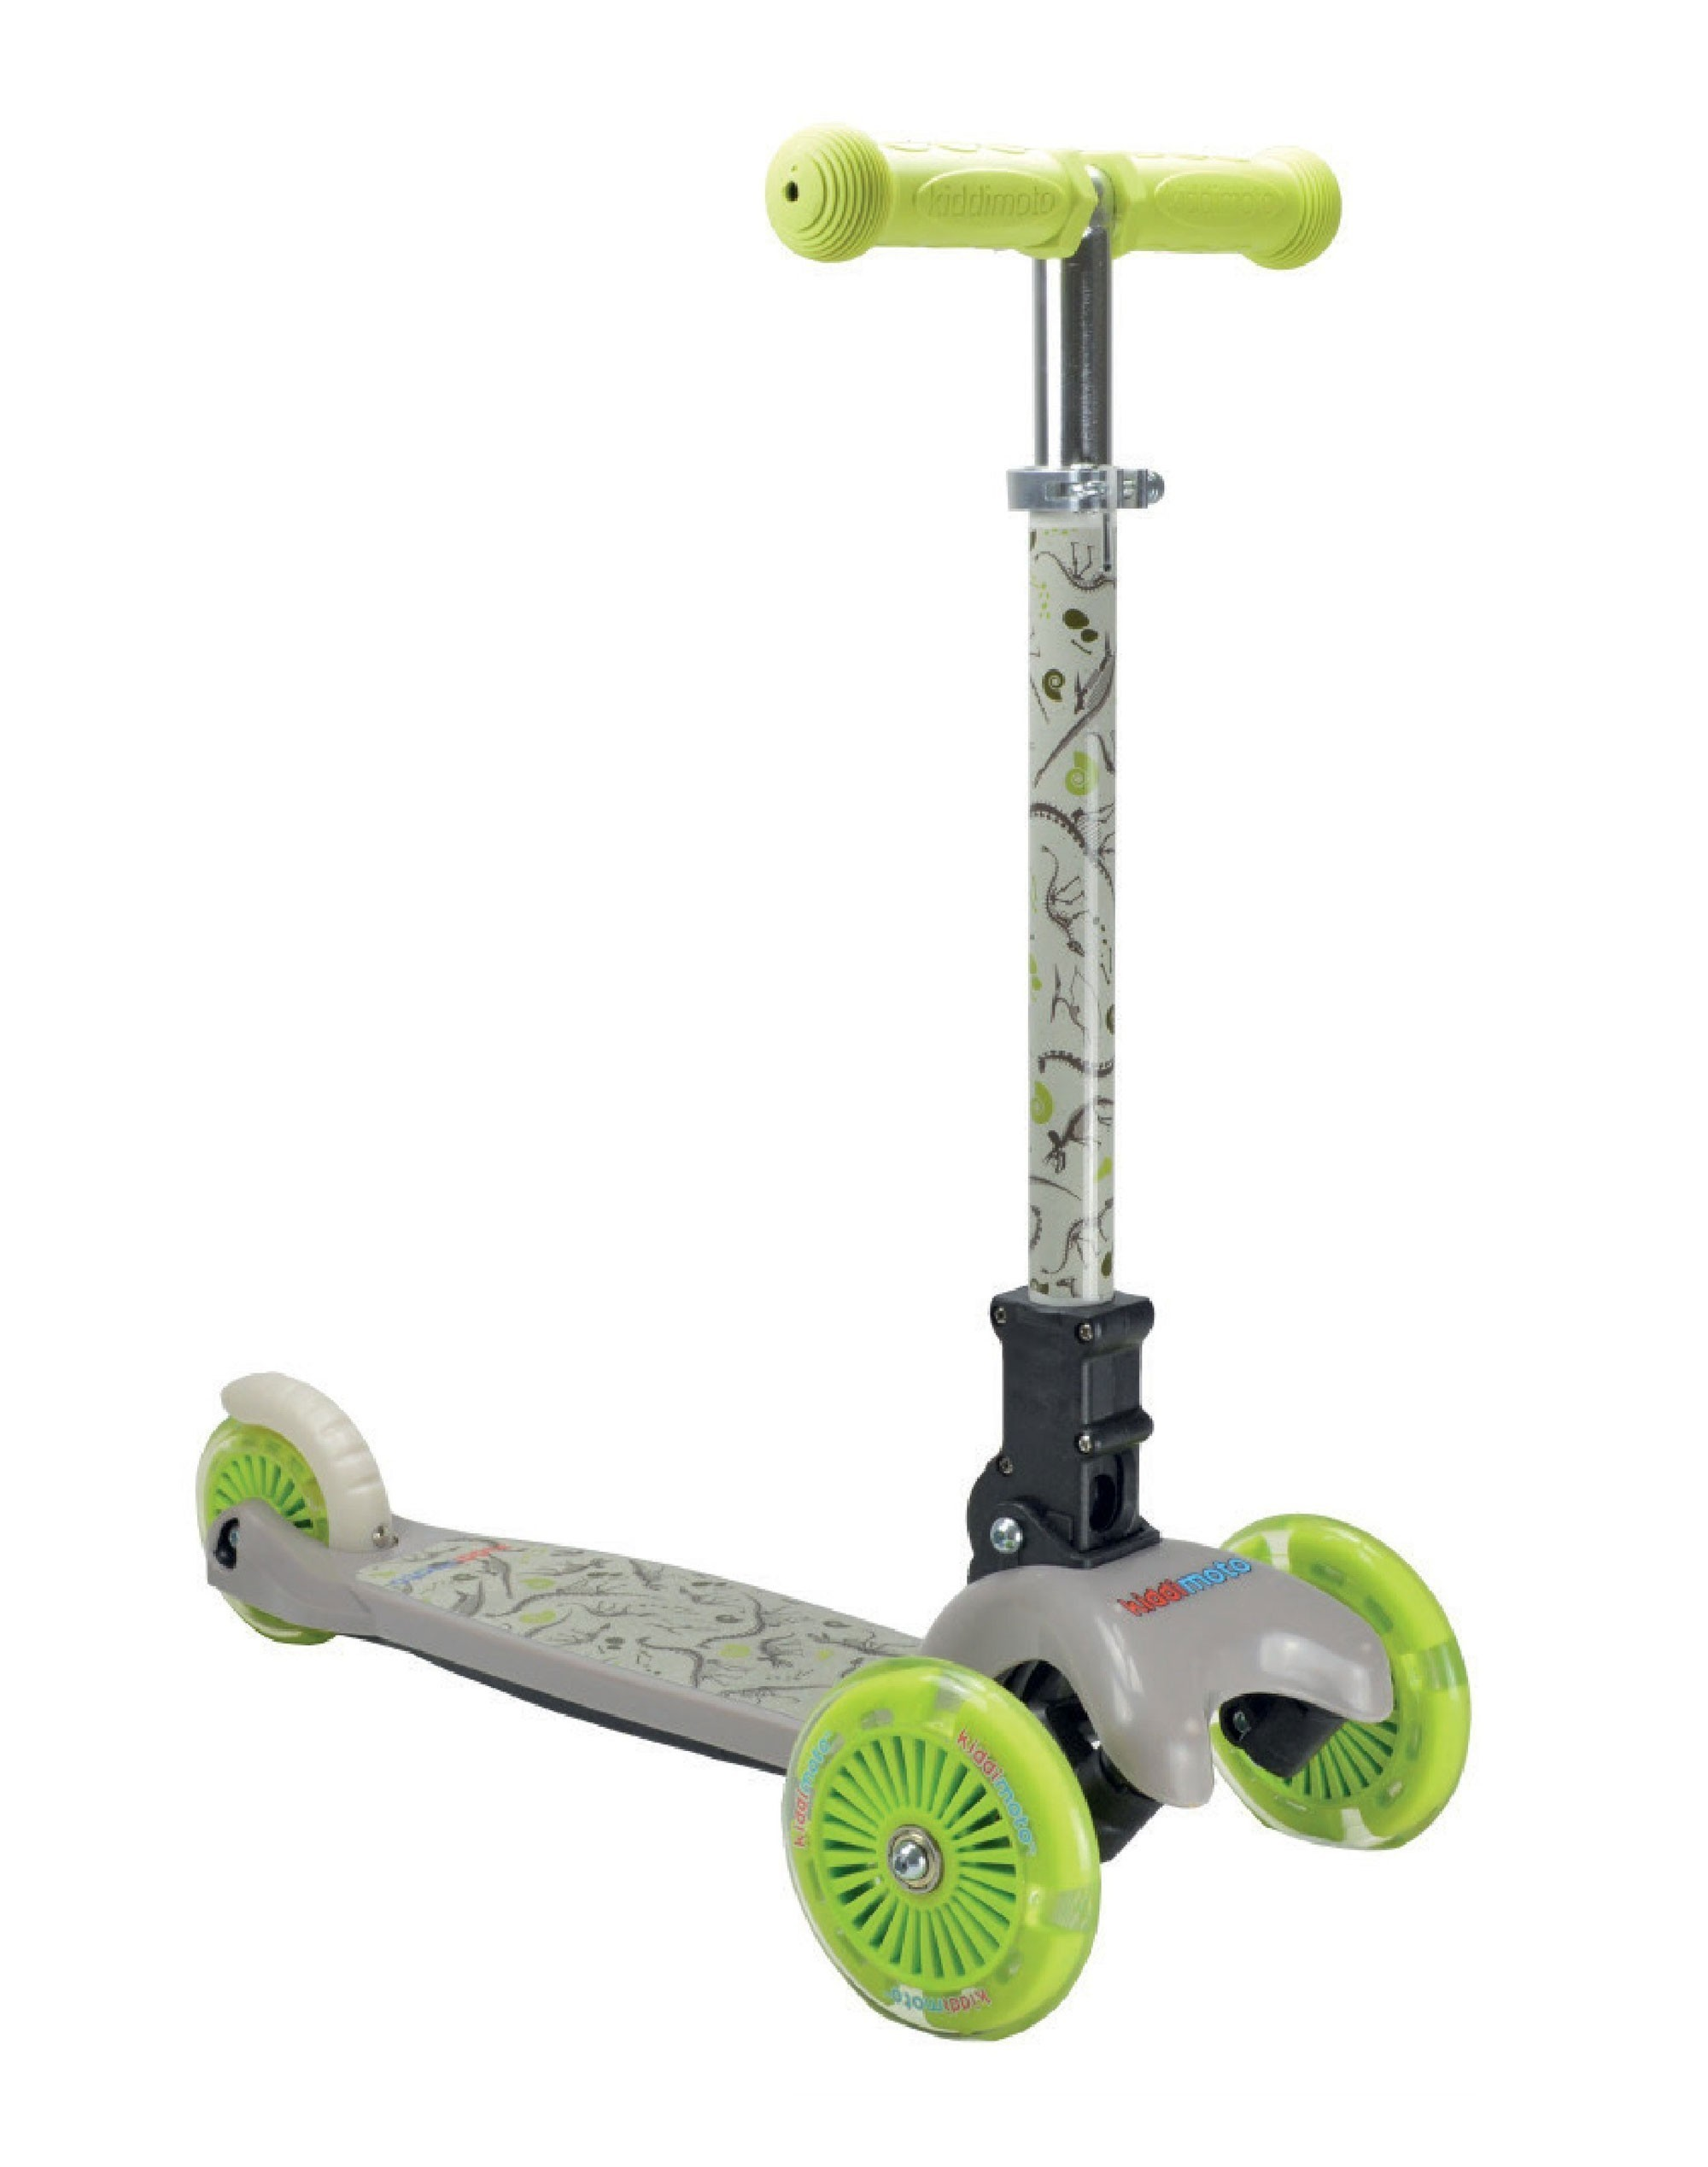 kiddimoto Scooter / Kinderroller U-Zoom Scooter klappbar Fossil Dino Bild 1